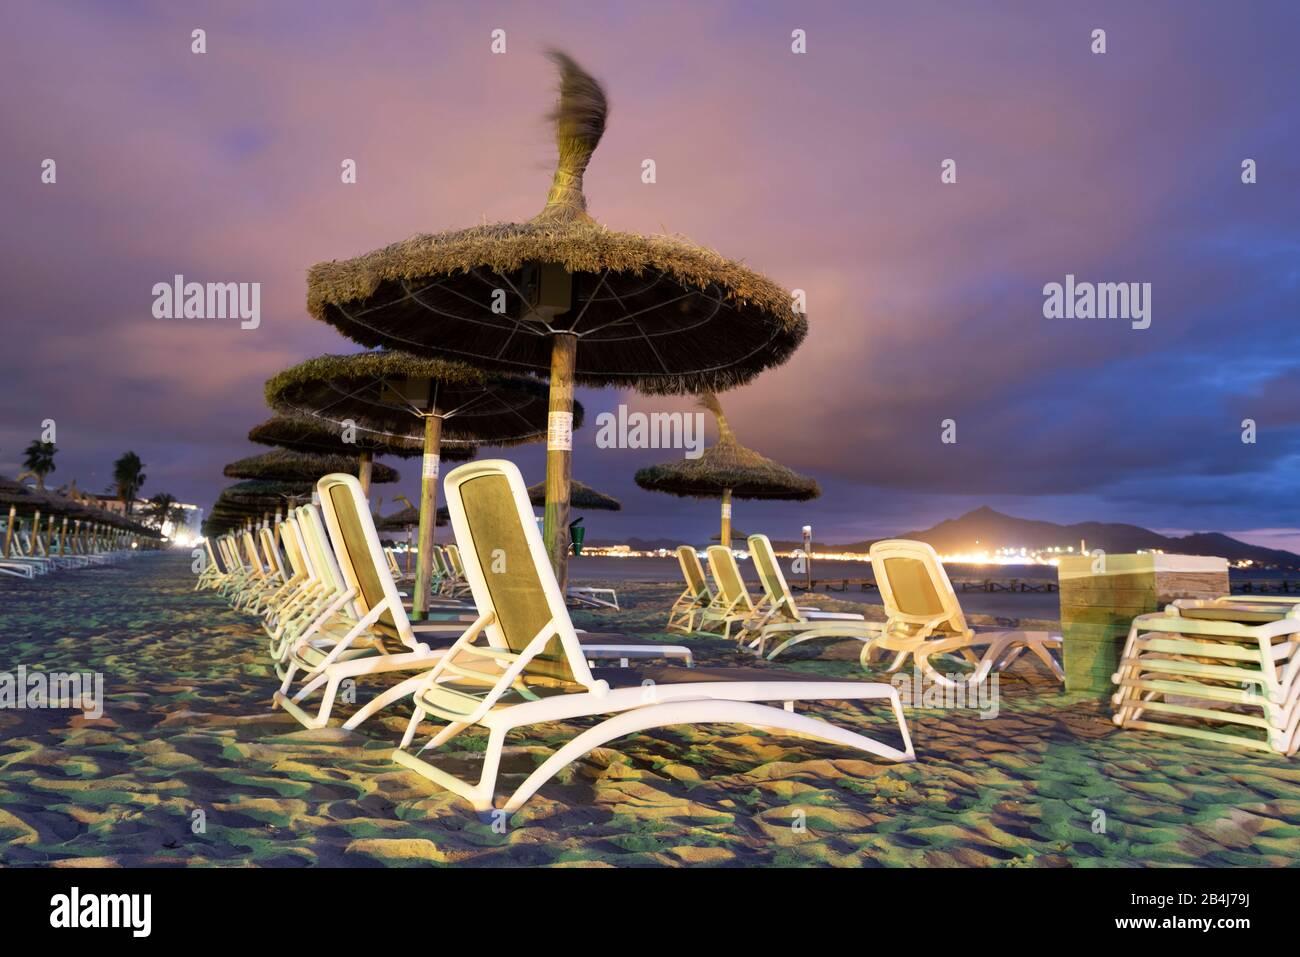 Spain, Mallorca, Playa de Muro, umbrellas and sun loungers on the beach Playa de Muro at the blue hour, north of Majorca. Stock Photo